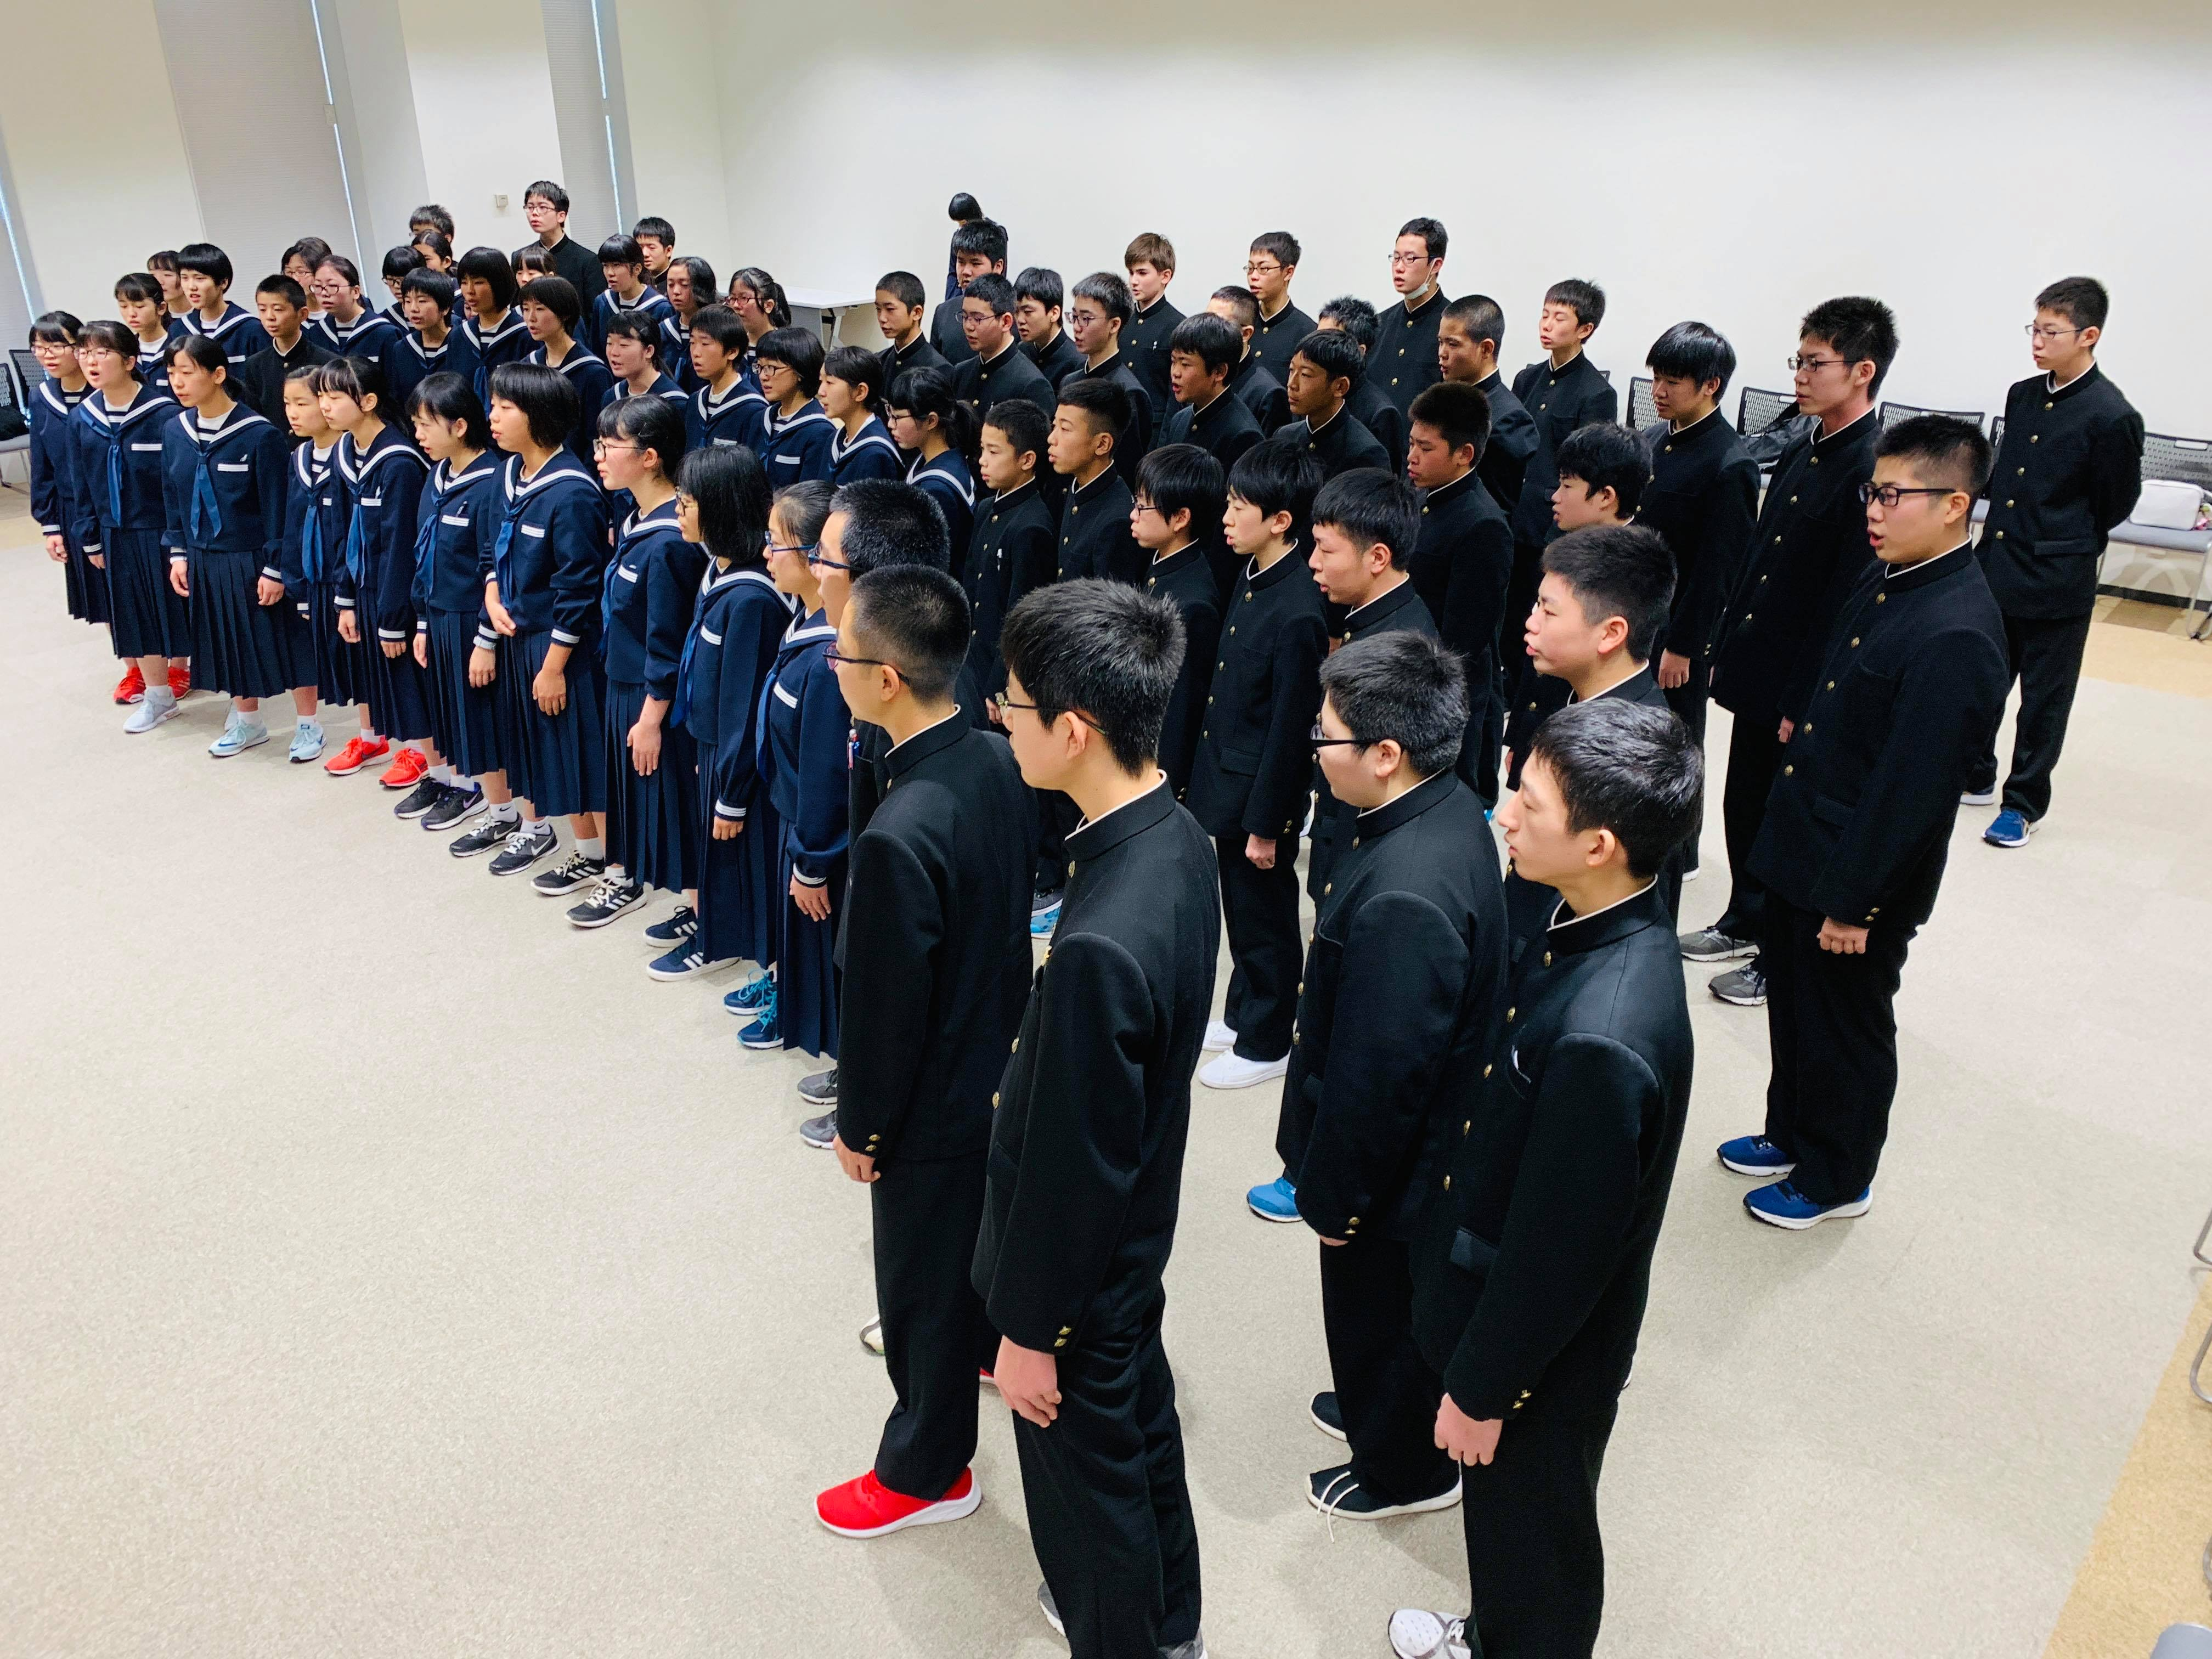 45516021 2119563964762499 8857838863624699904 n - 2018年11月7日青森県東北中学校AFS(AOsukiフューチャーズゼミ)開催しました。